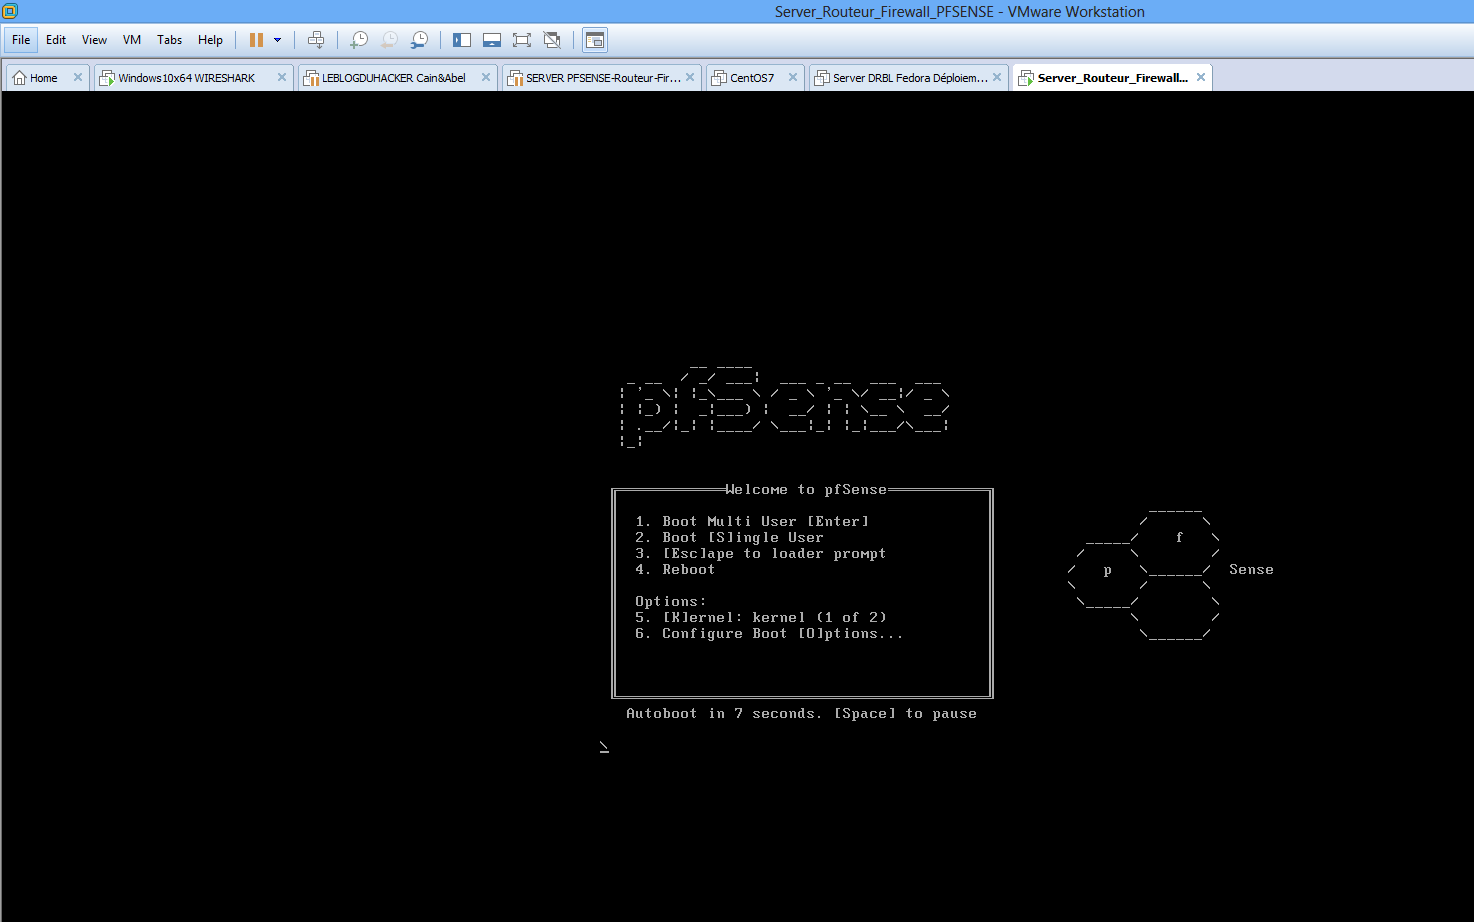 Capture Démarrage install Server roteur firewall PFSENSE